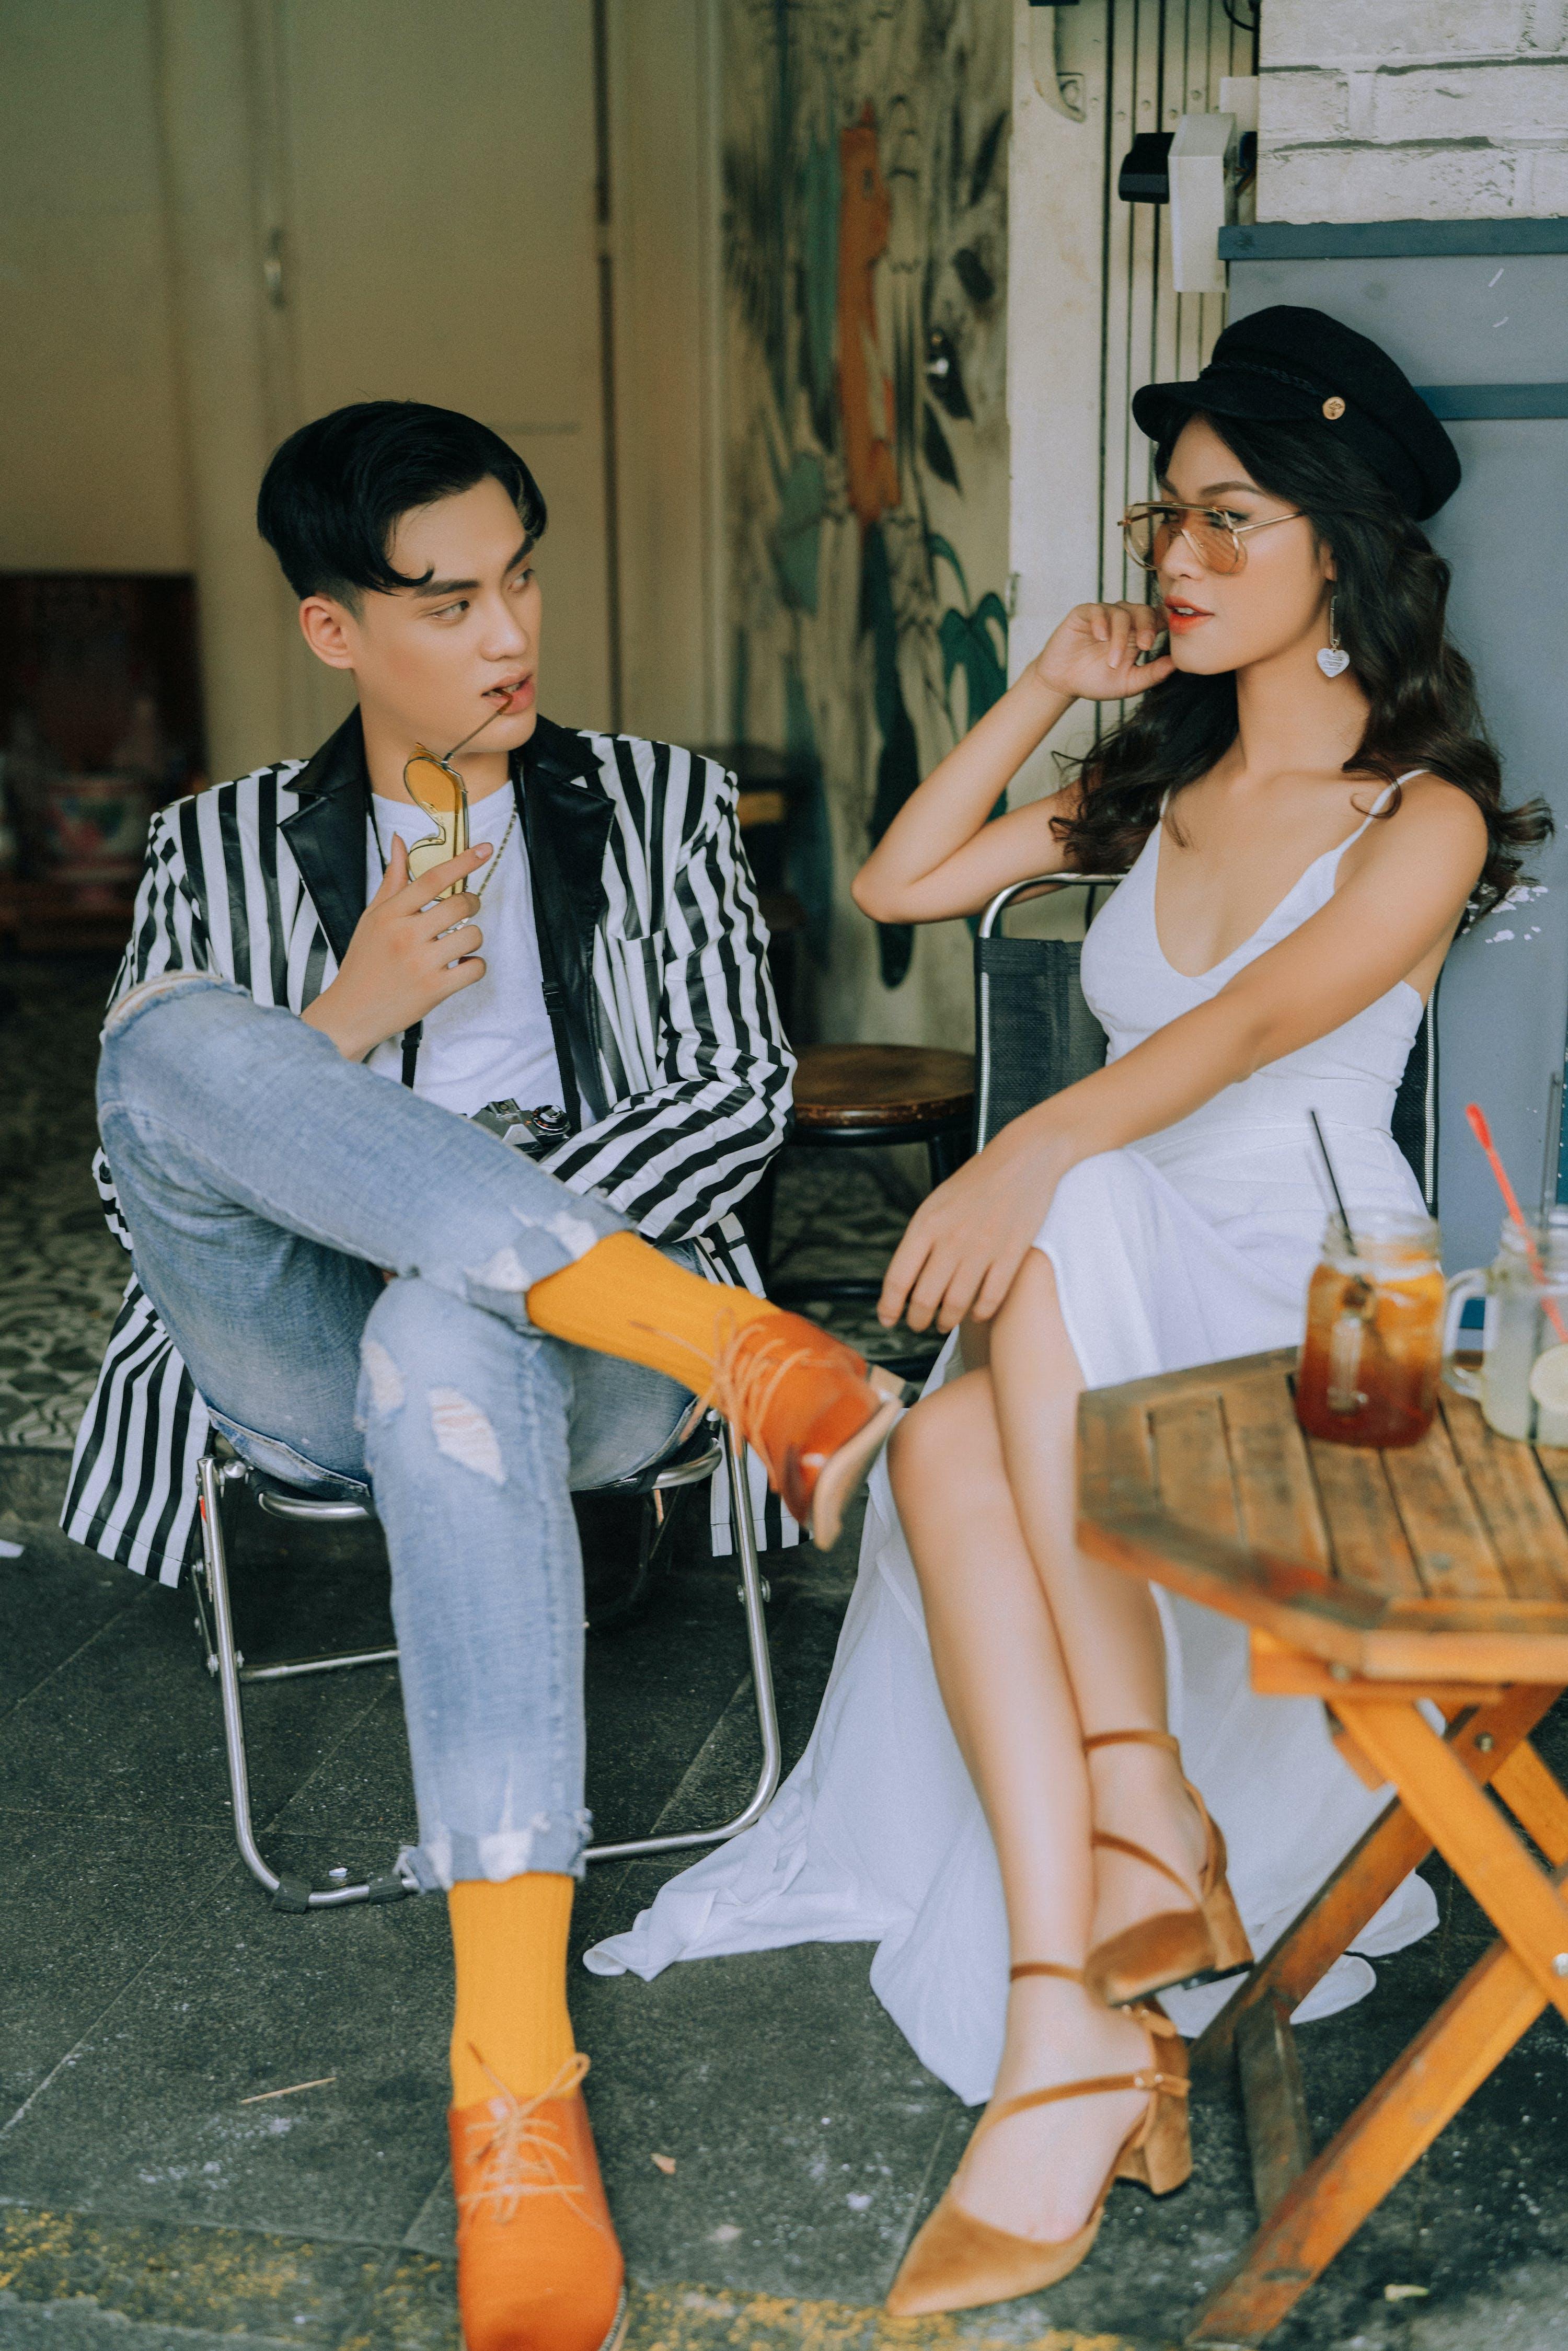 Man Sitting on Folding Chair Beside Woman Sitting Near Table